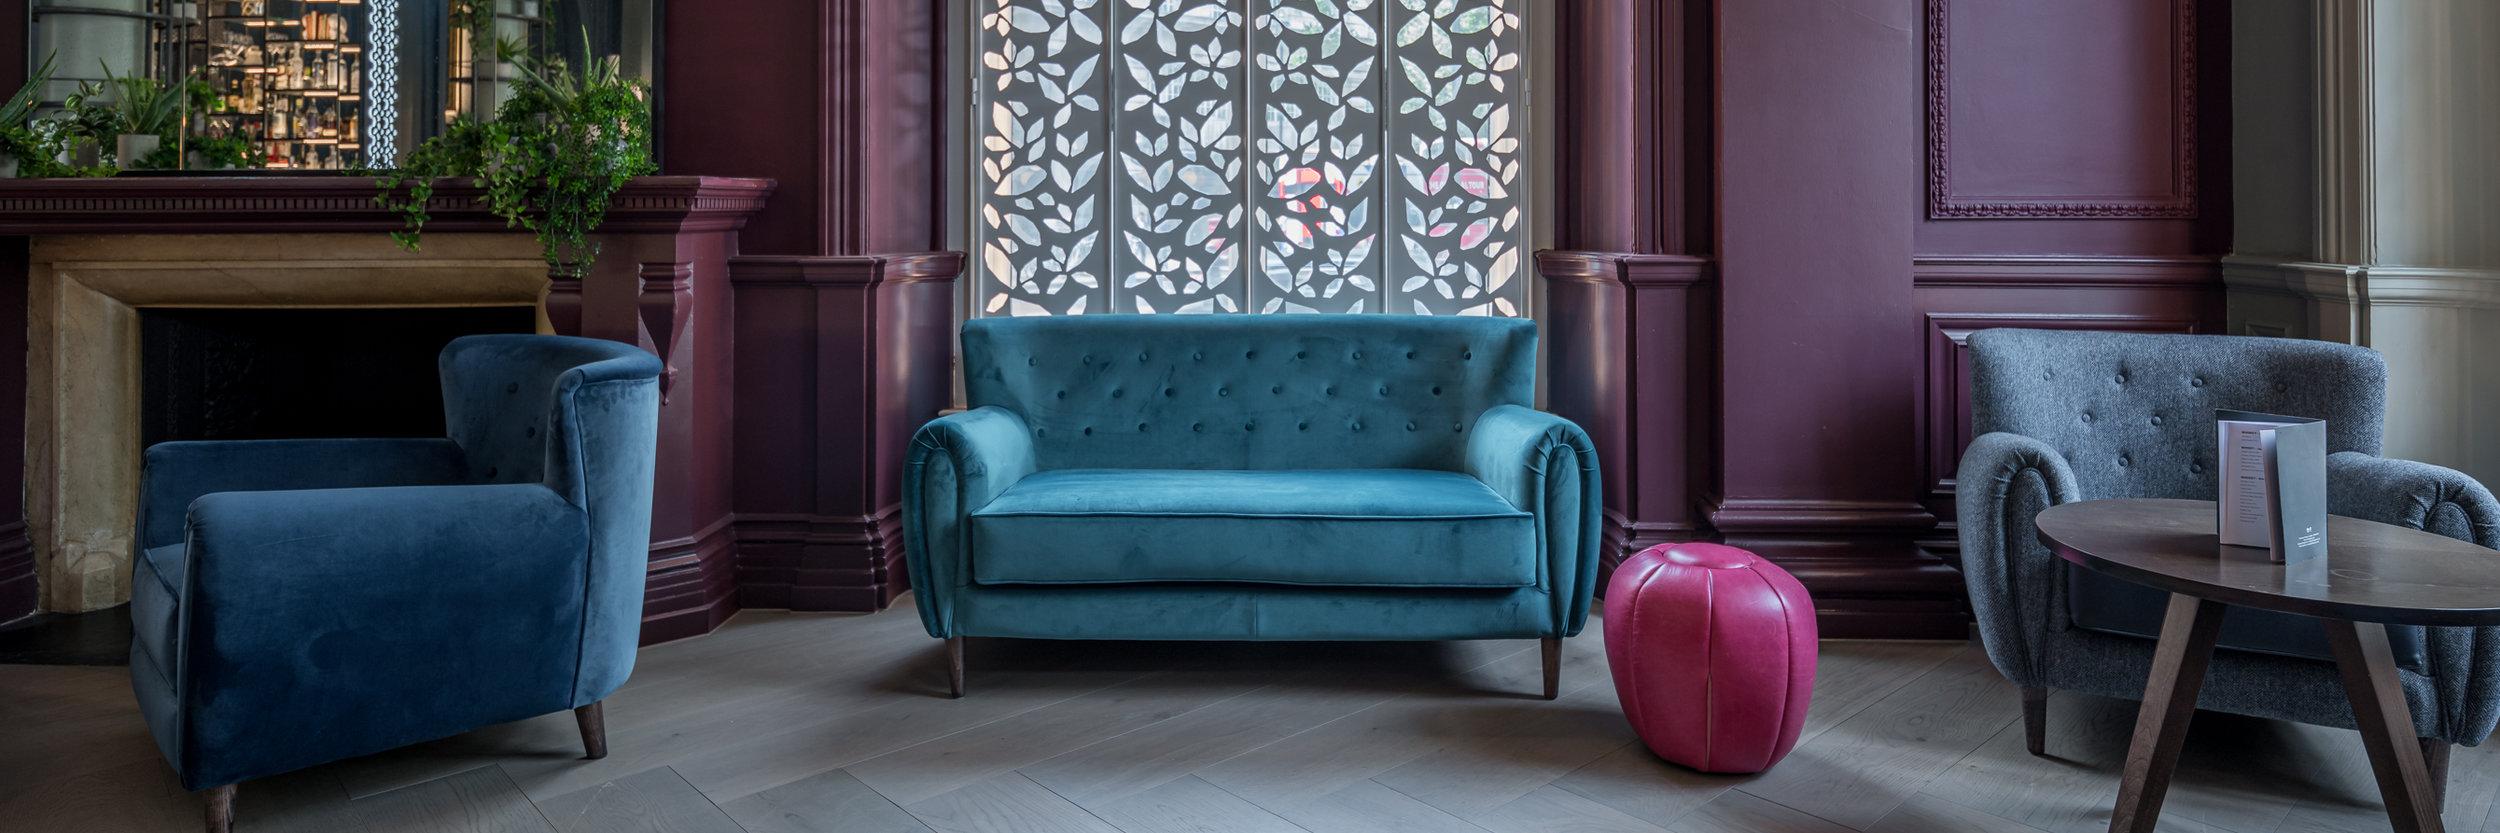 1 - Franklin & Franklin, Bespoke Armchairs, Sofa & Poufs, (2019)